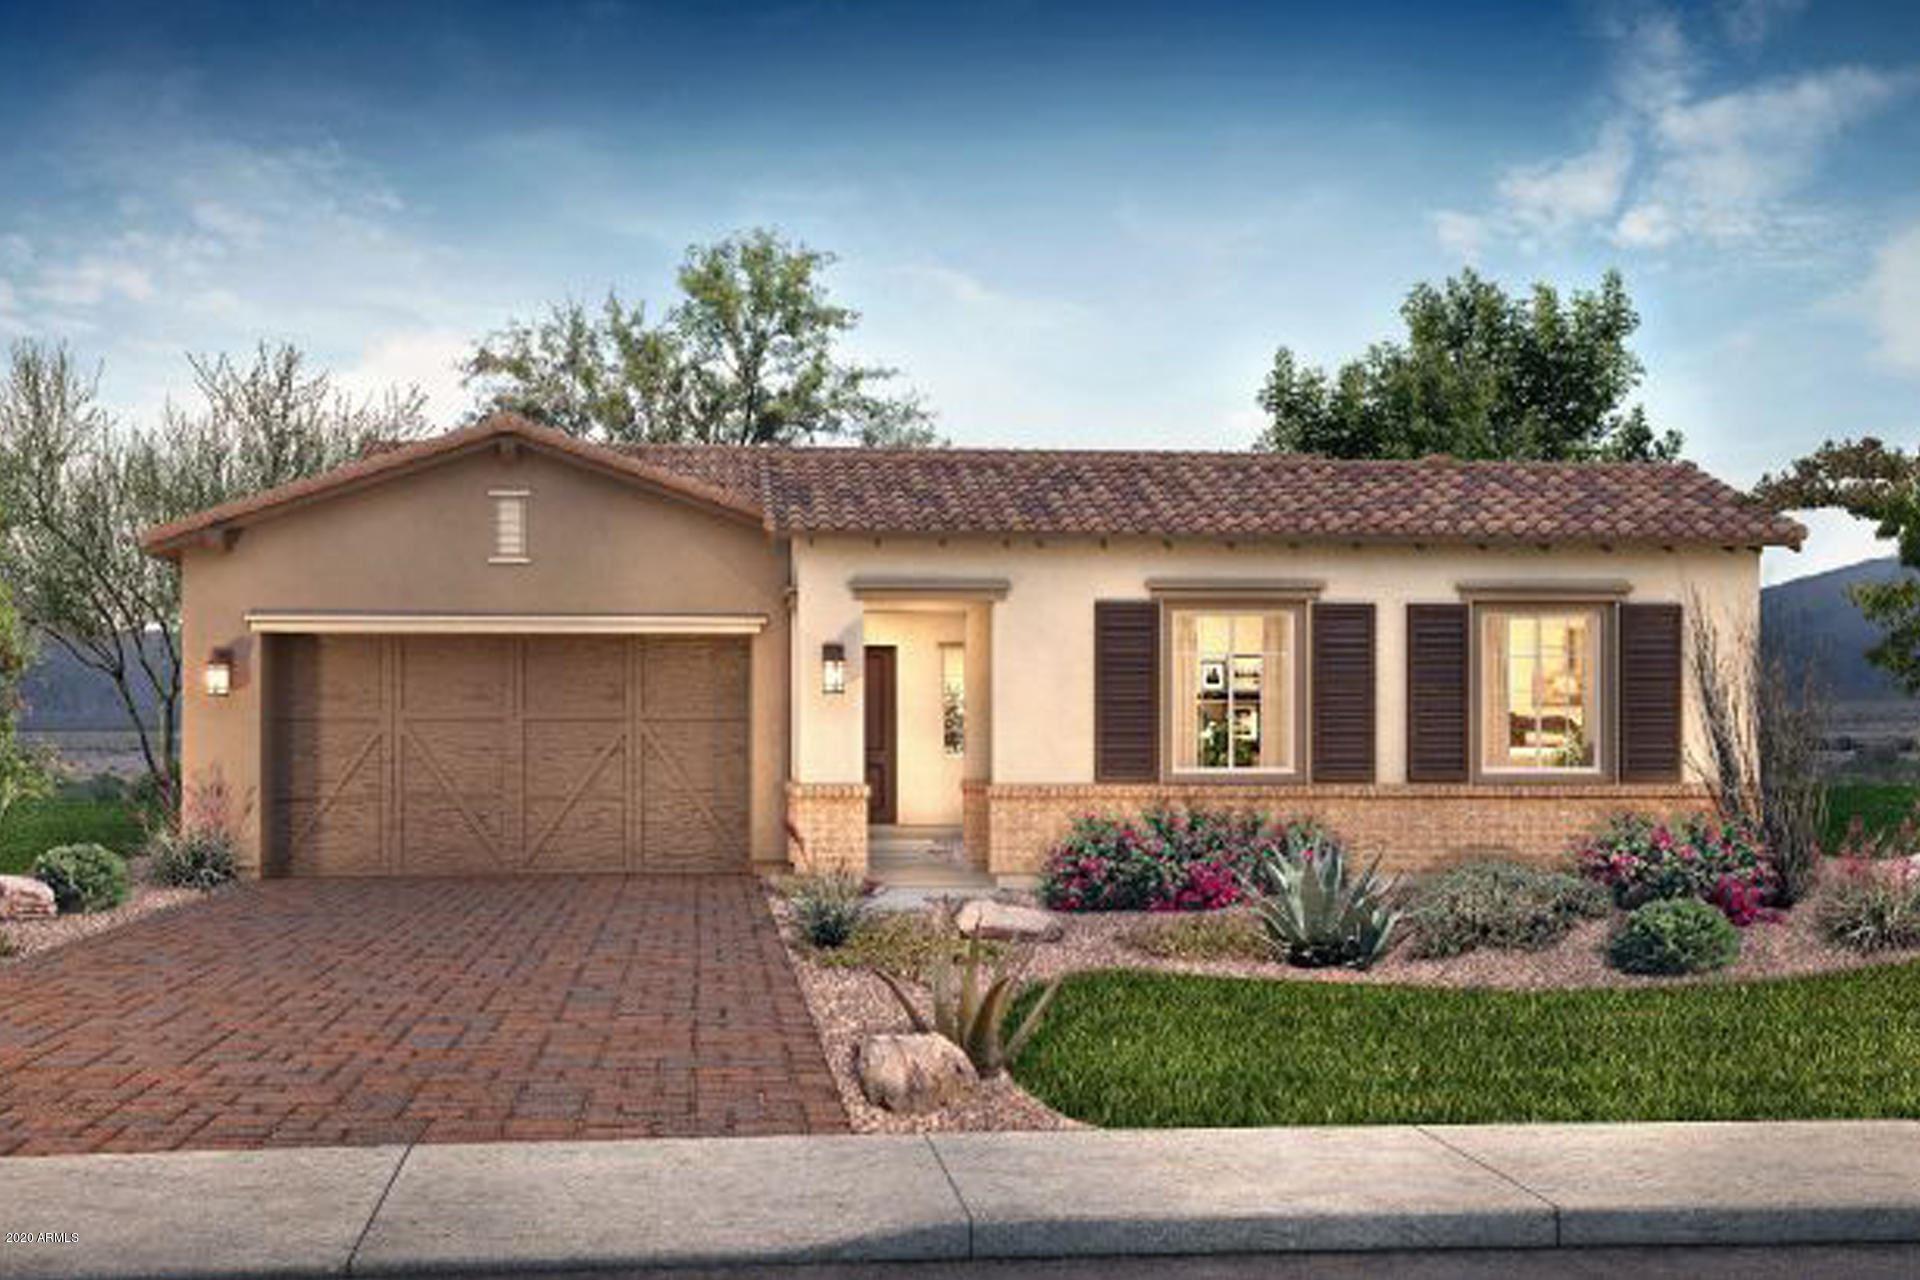 2336 E CHAMA Drive, Phoenix, AZ 85024 - MLS#: 6075386